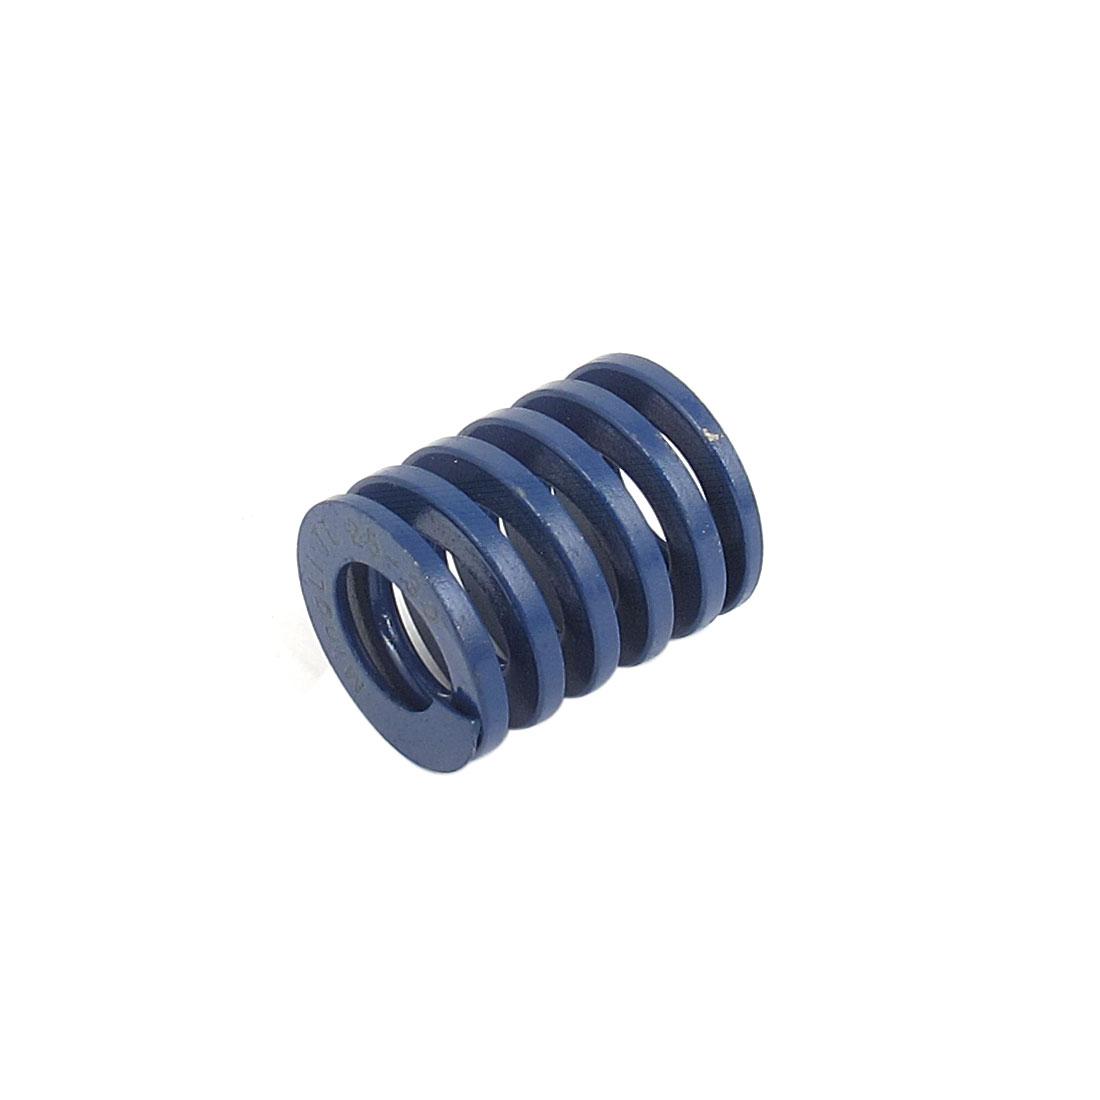 25mmx30mm Chromium Alloy Steel Light Load Die Spring Blue